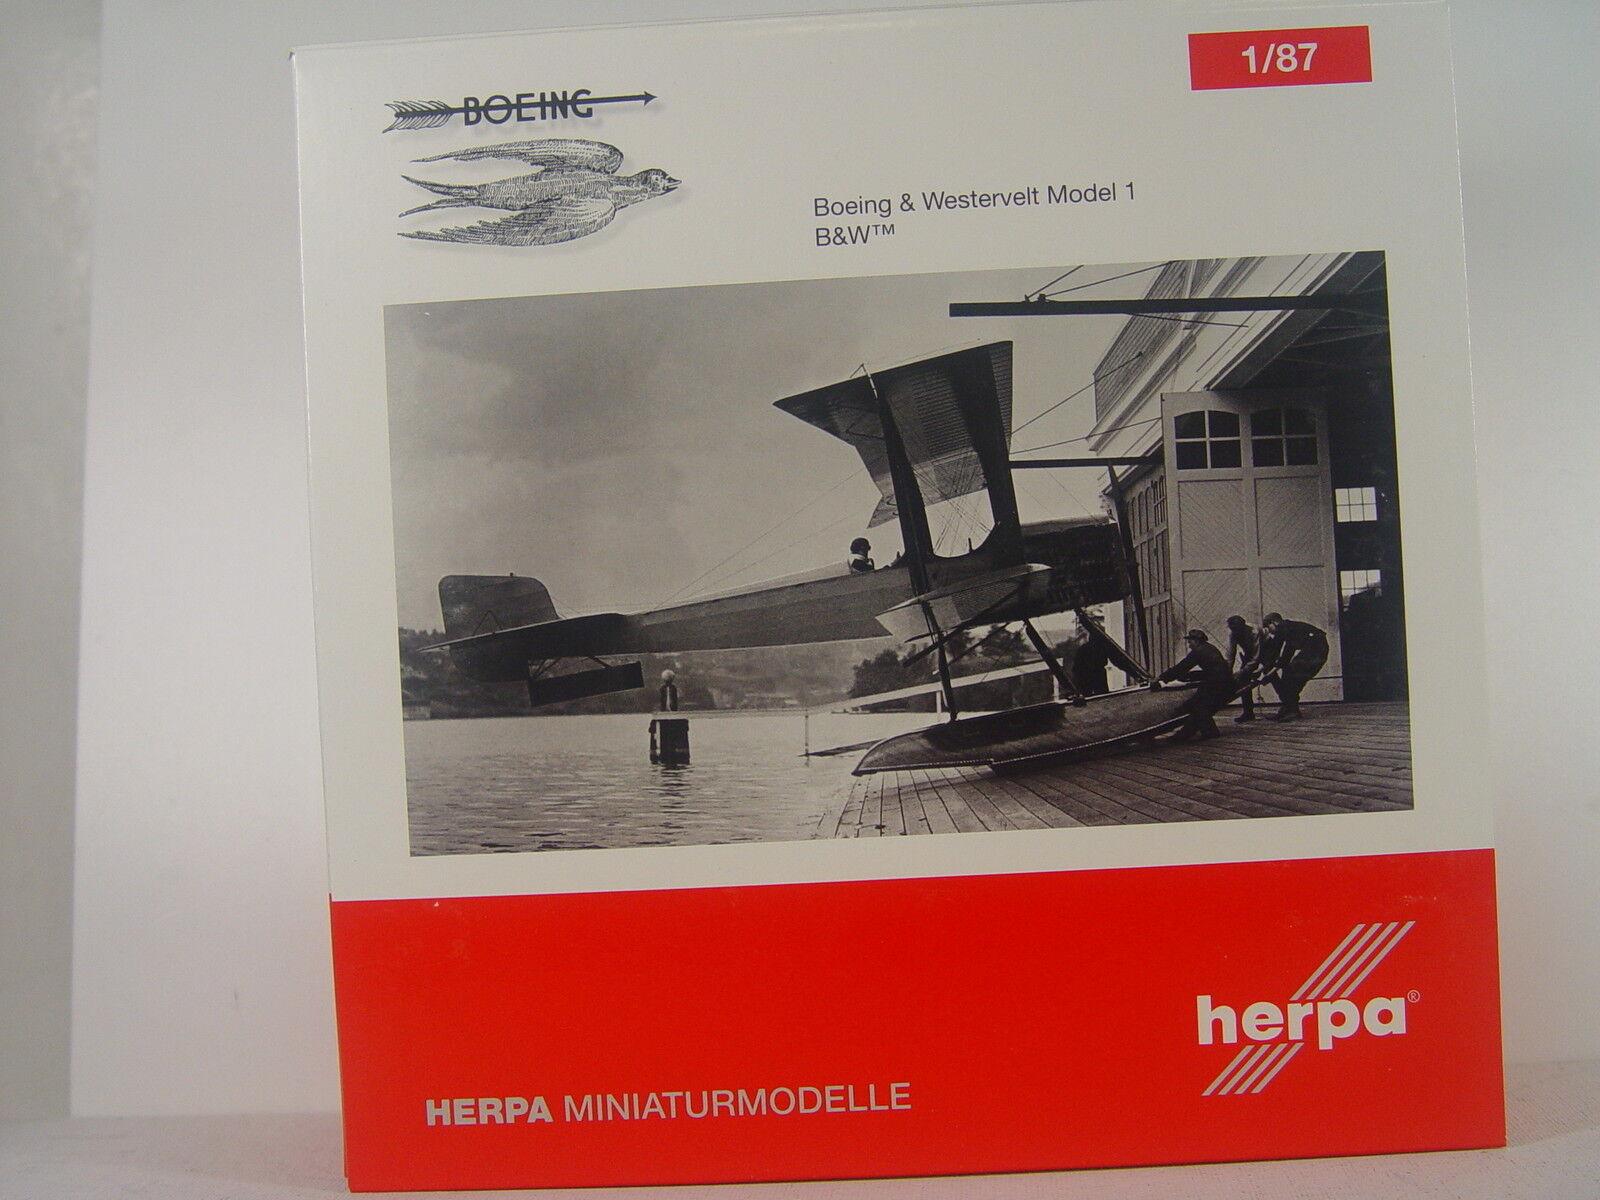 Boeing & westervelt MODEL 1 biplan-Herpa Modèle 1:87 - 019316 # E | D'adopter La Technologie De Pointe